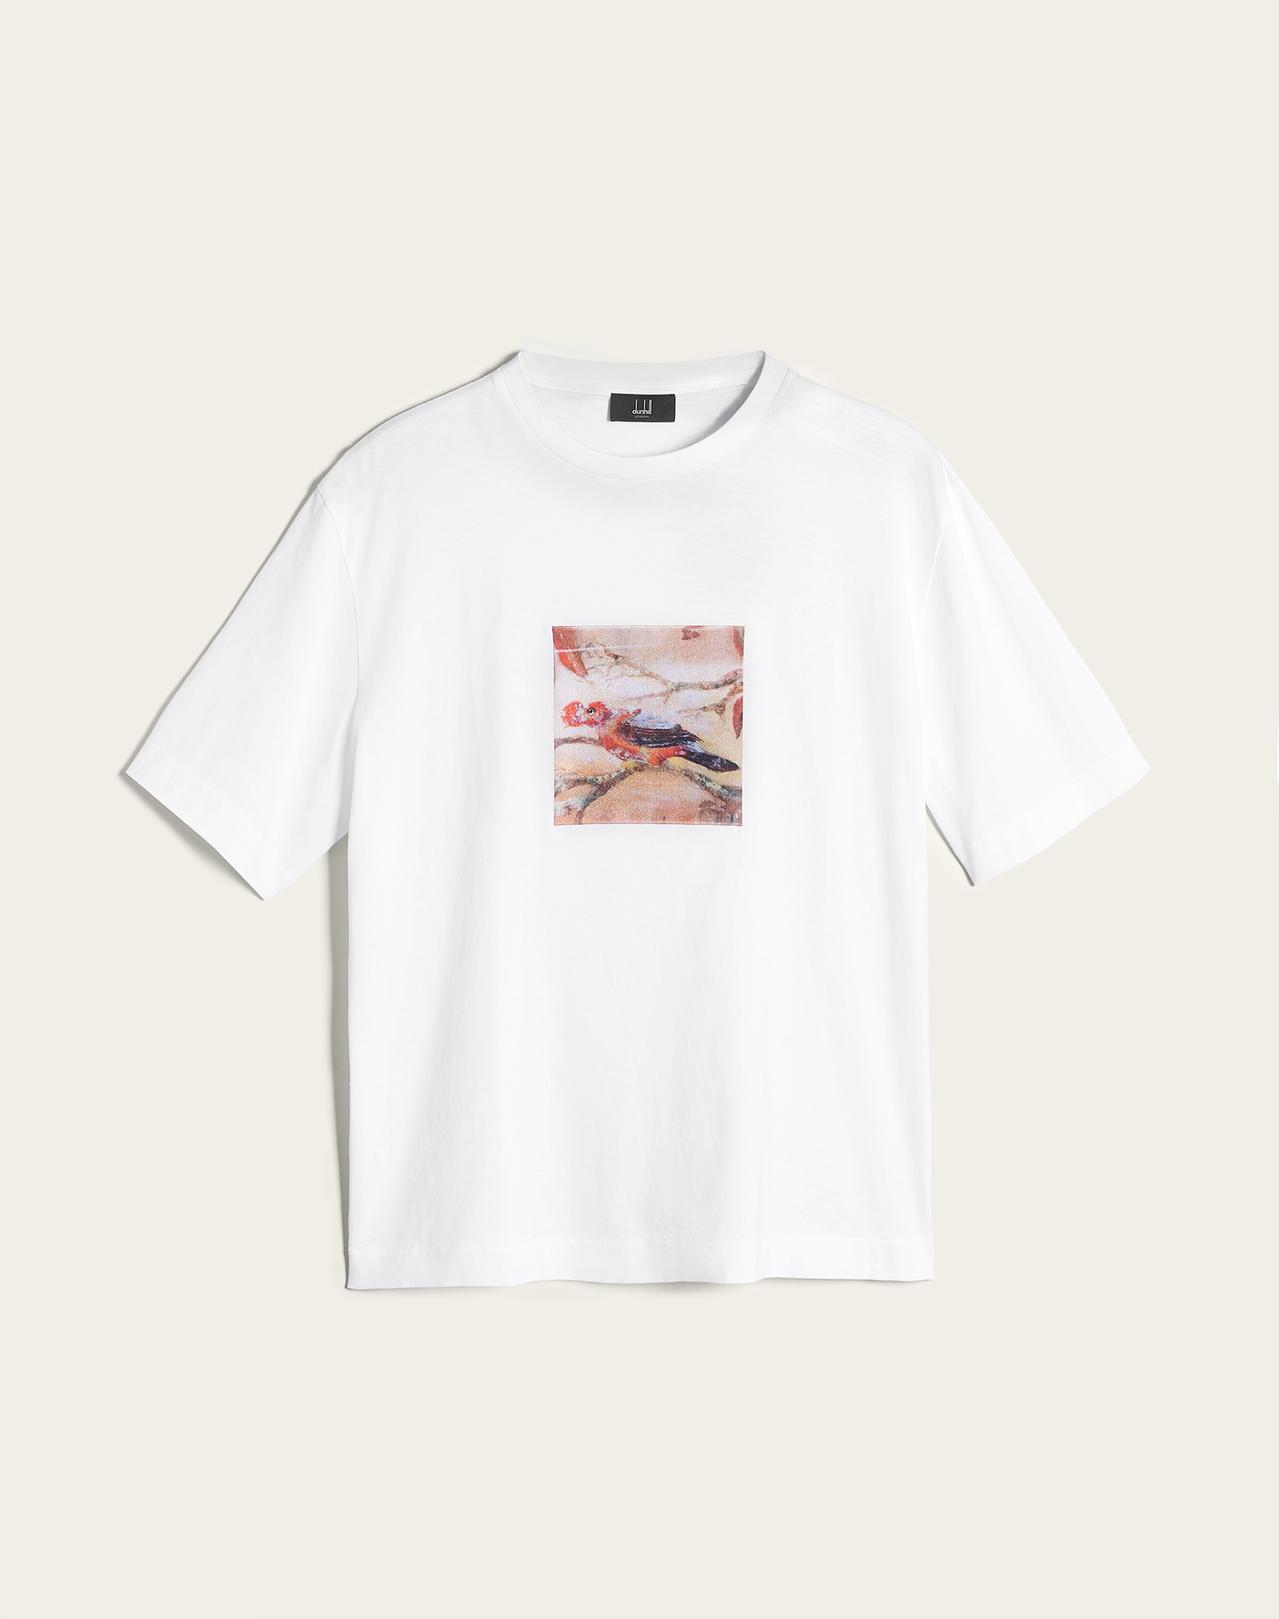 Aquarium迷你限量系列T恤,價格店洽。圖/dunhill提供